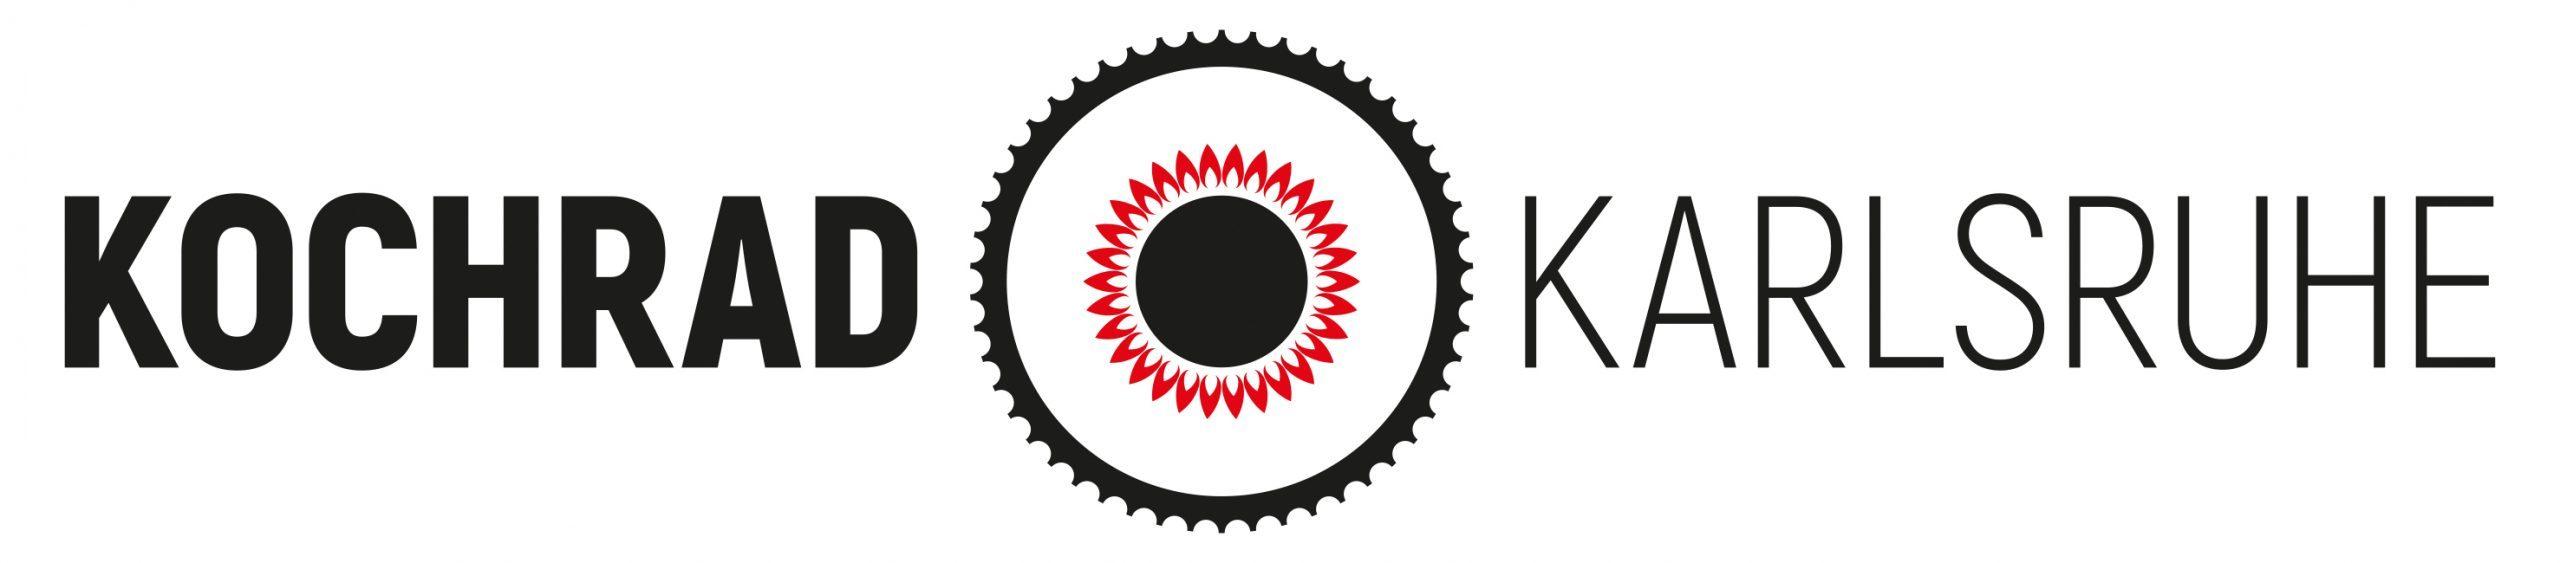 Kochrad Karlsruhe